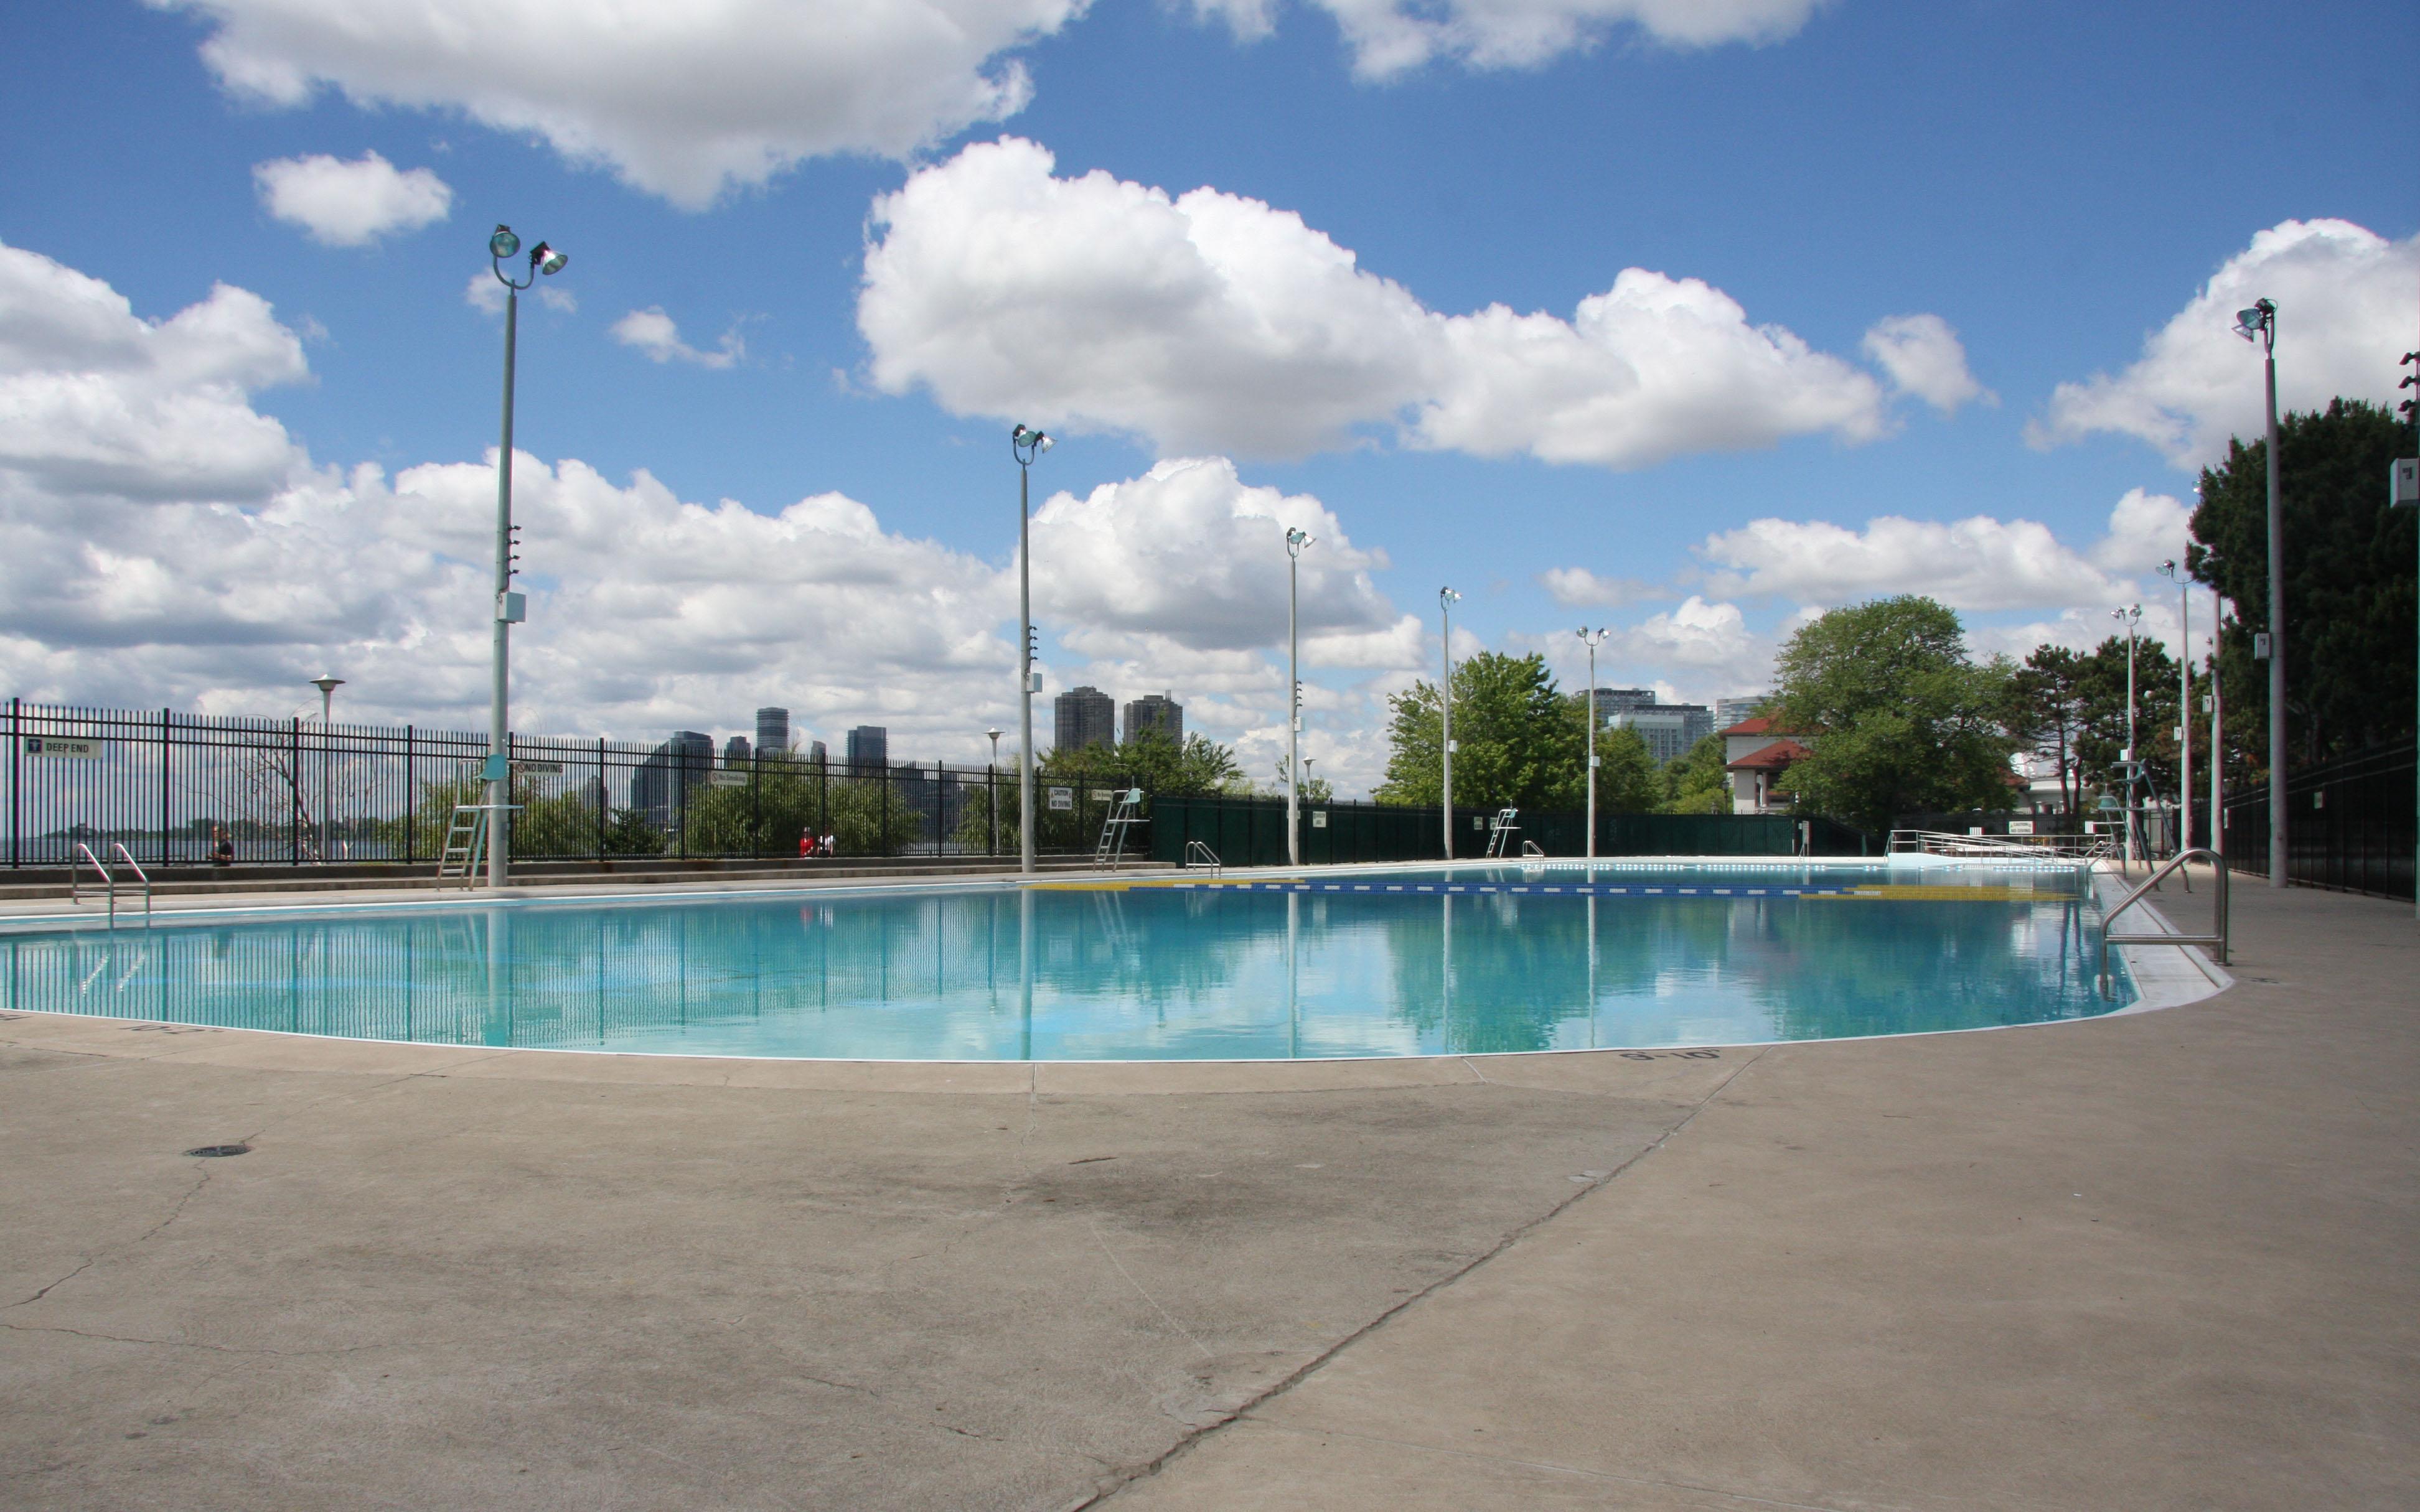 Sunnyside Gus Ryder Outdoor Pool - City of Toronto